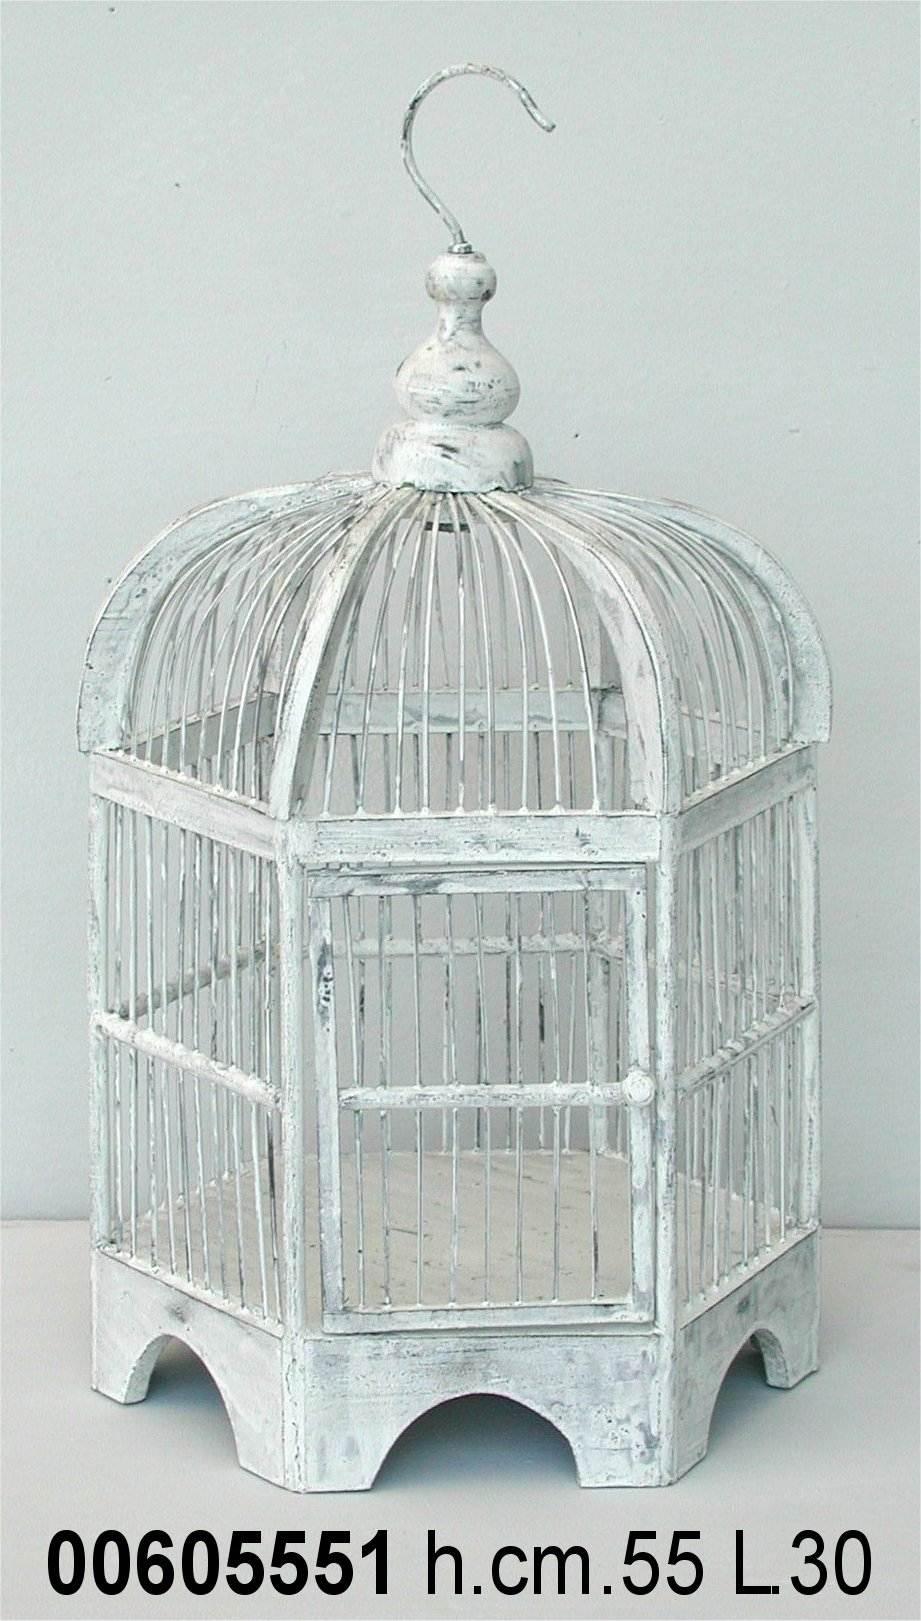 Antica soffitta gabbia per uccelli decorativa esagonale - Lanterne portacandele ikea ...